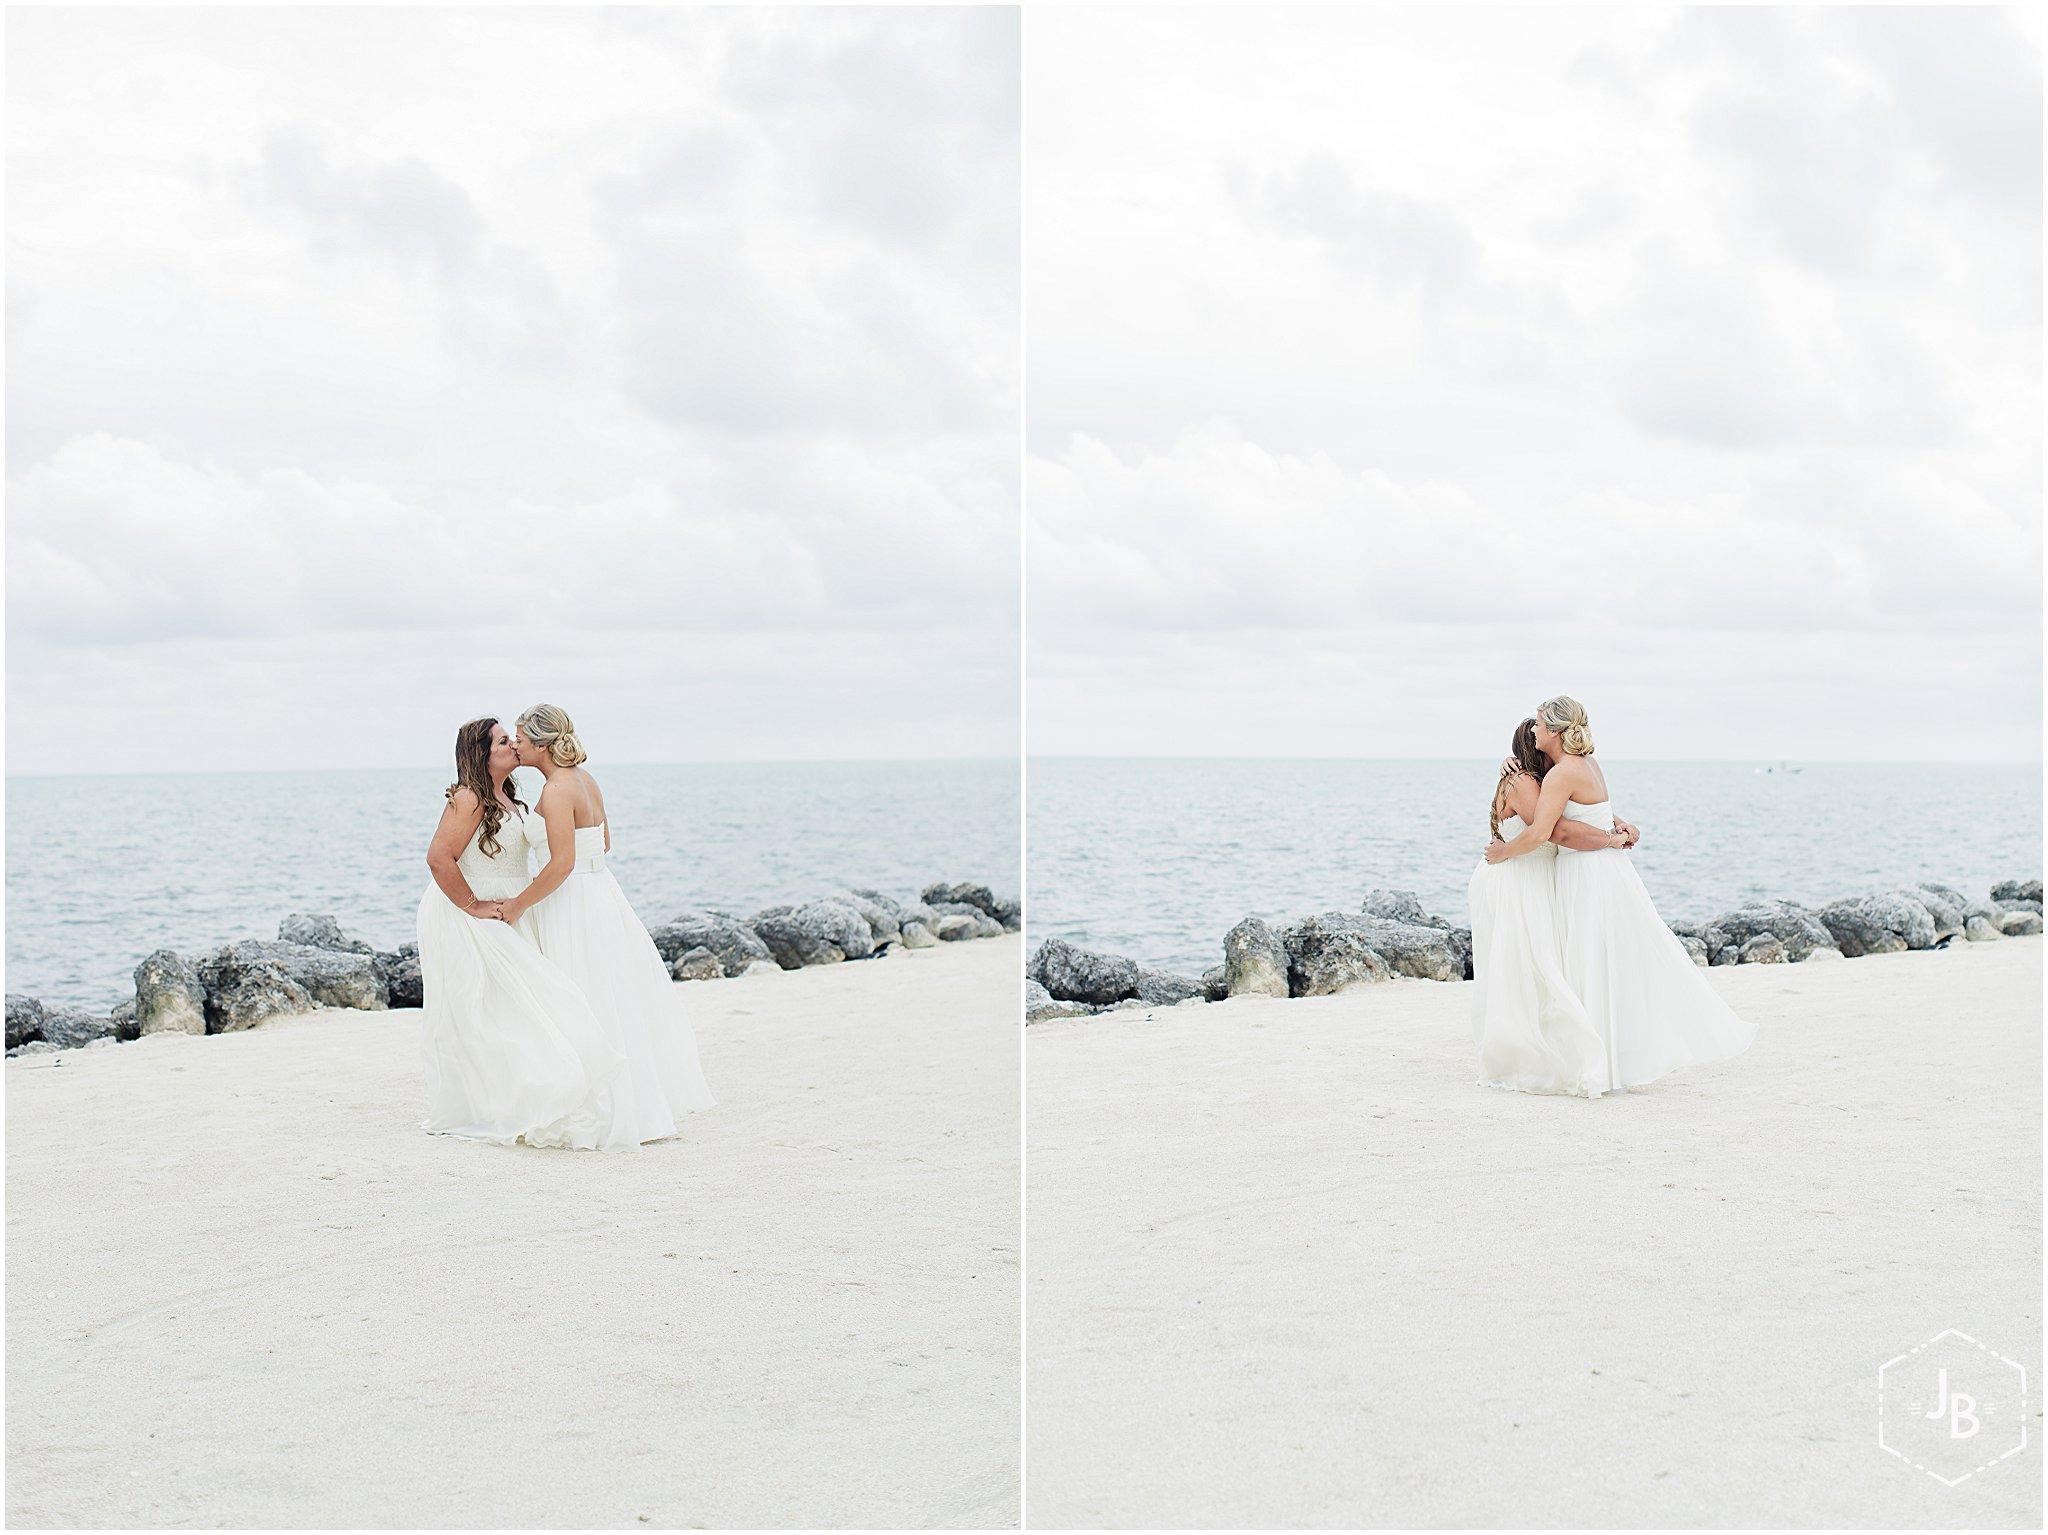 WeddingandEngagementFloridaPhotographer_1439.jpg